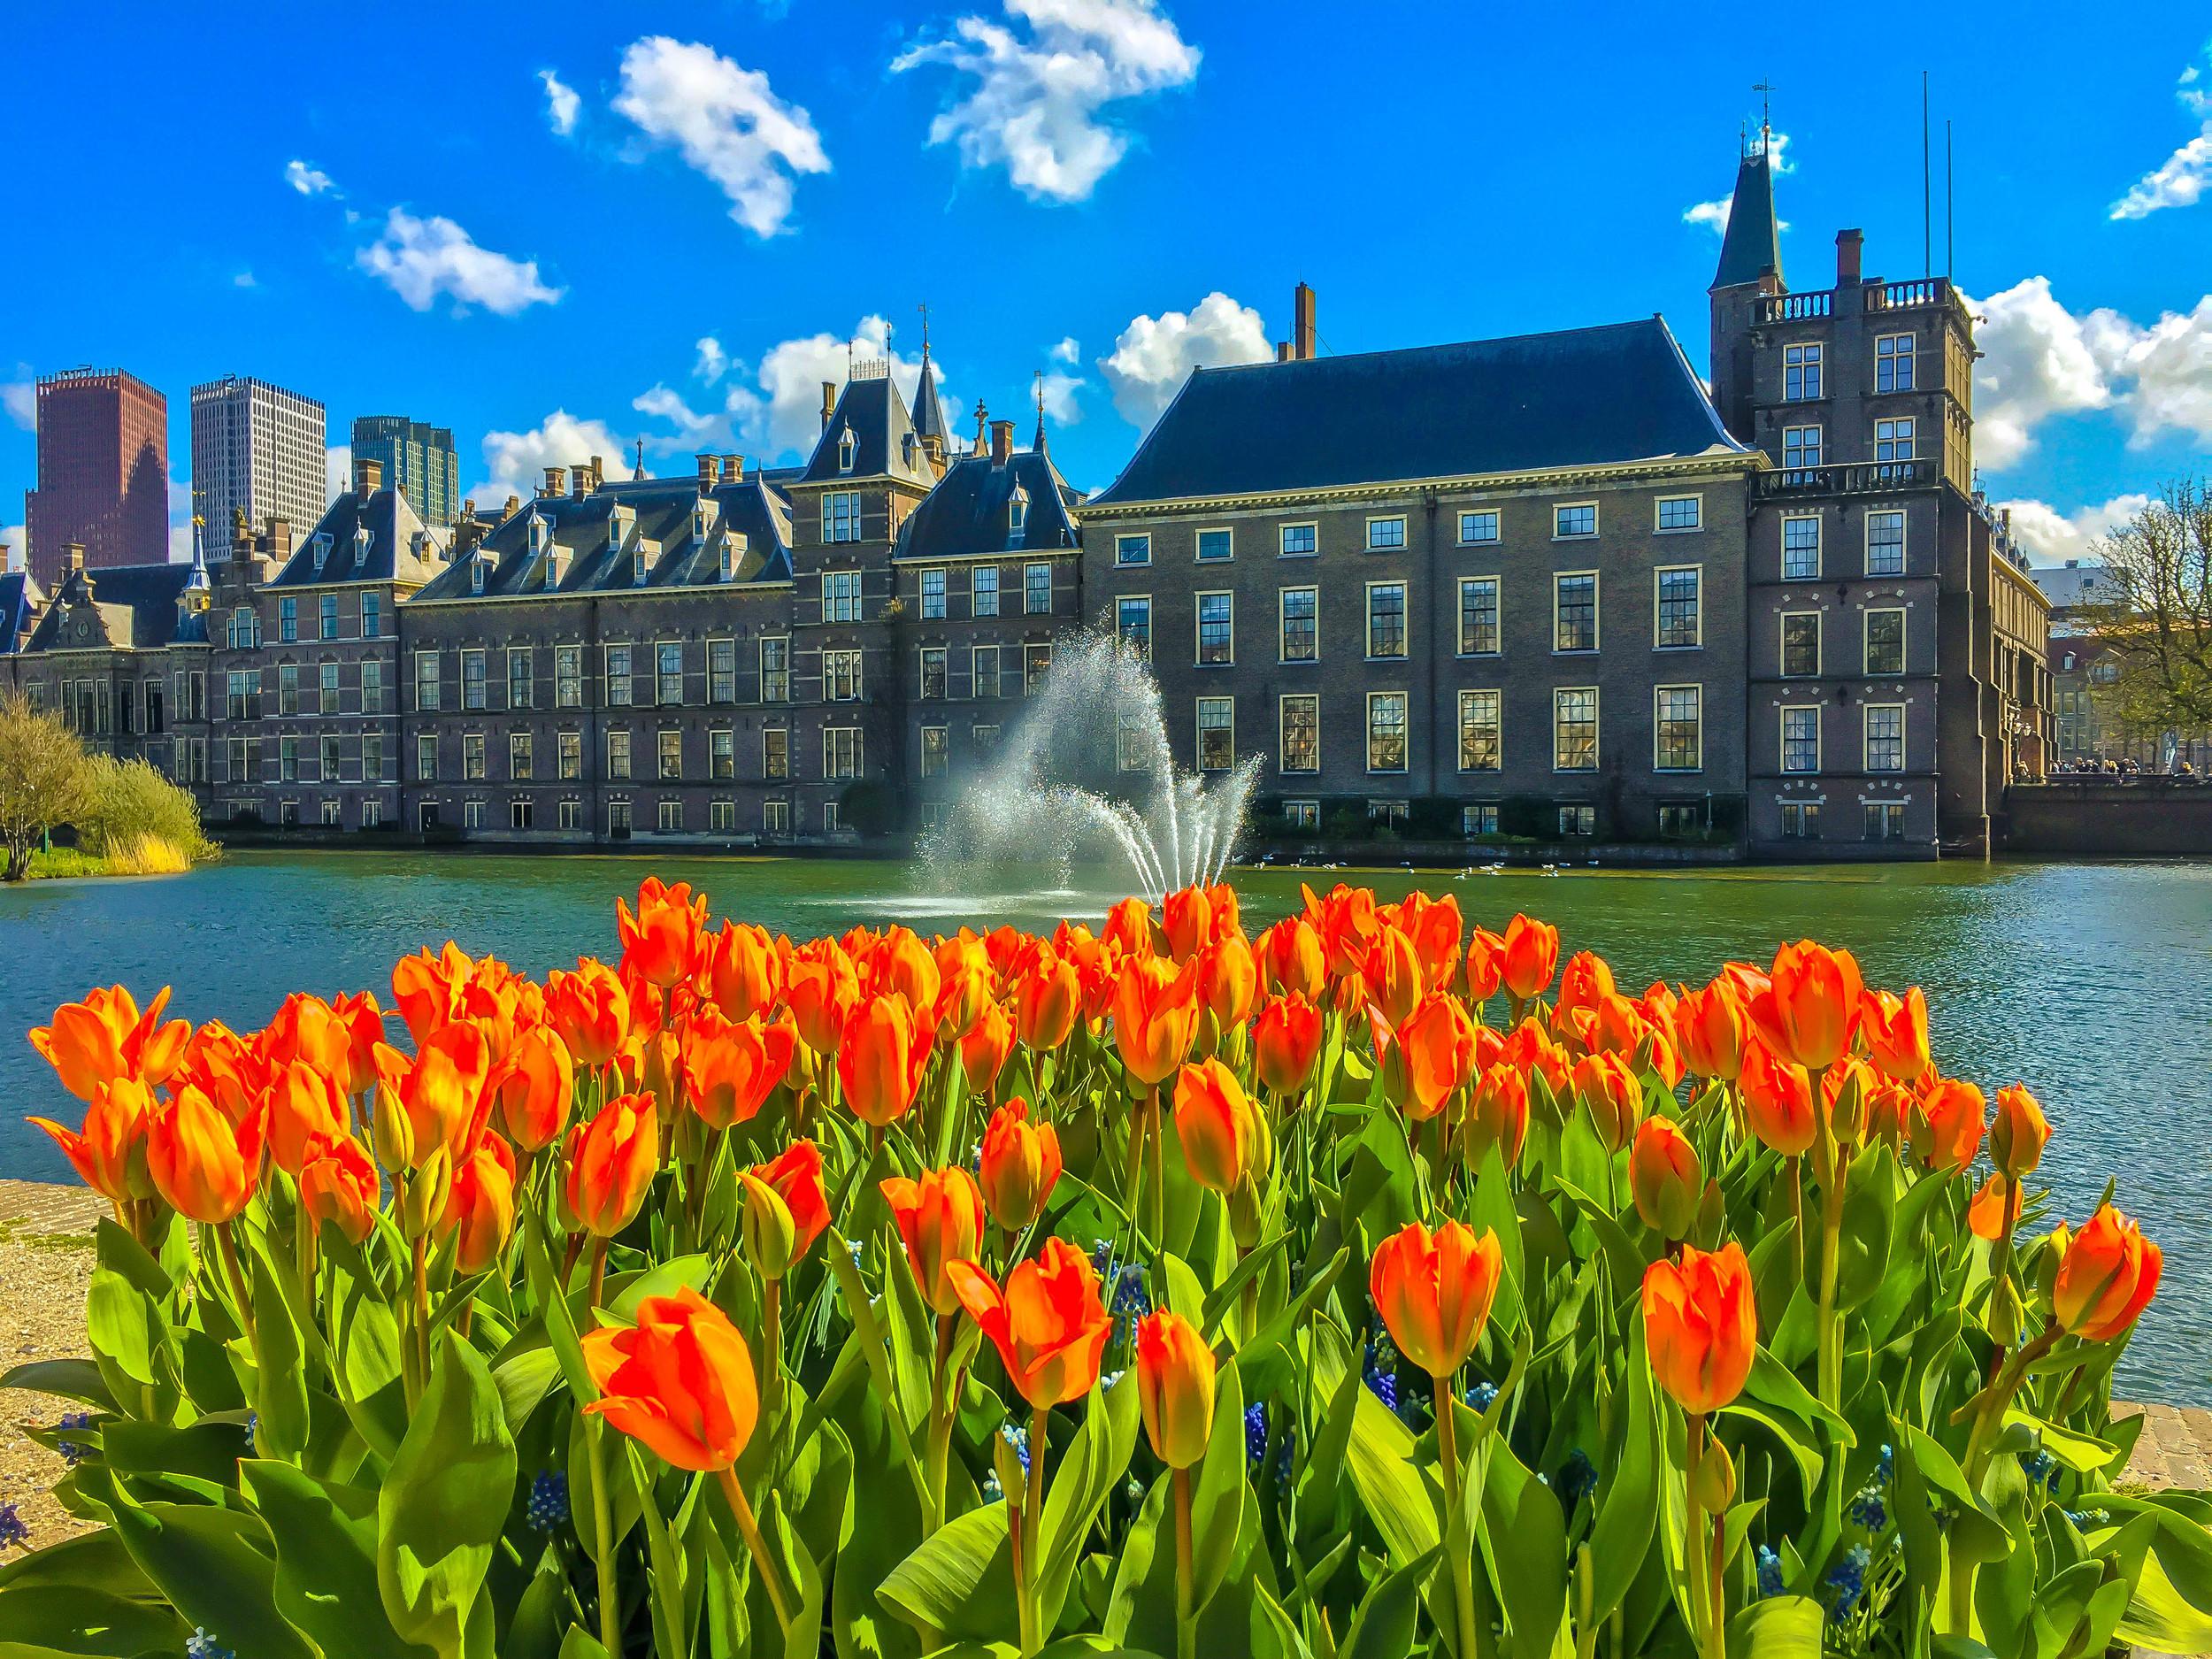 Quintessential Netherlands. Den Haag.